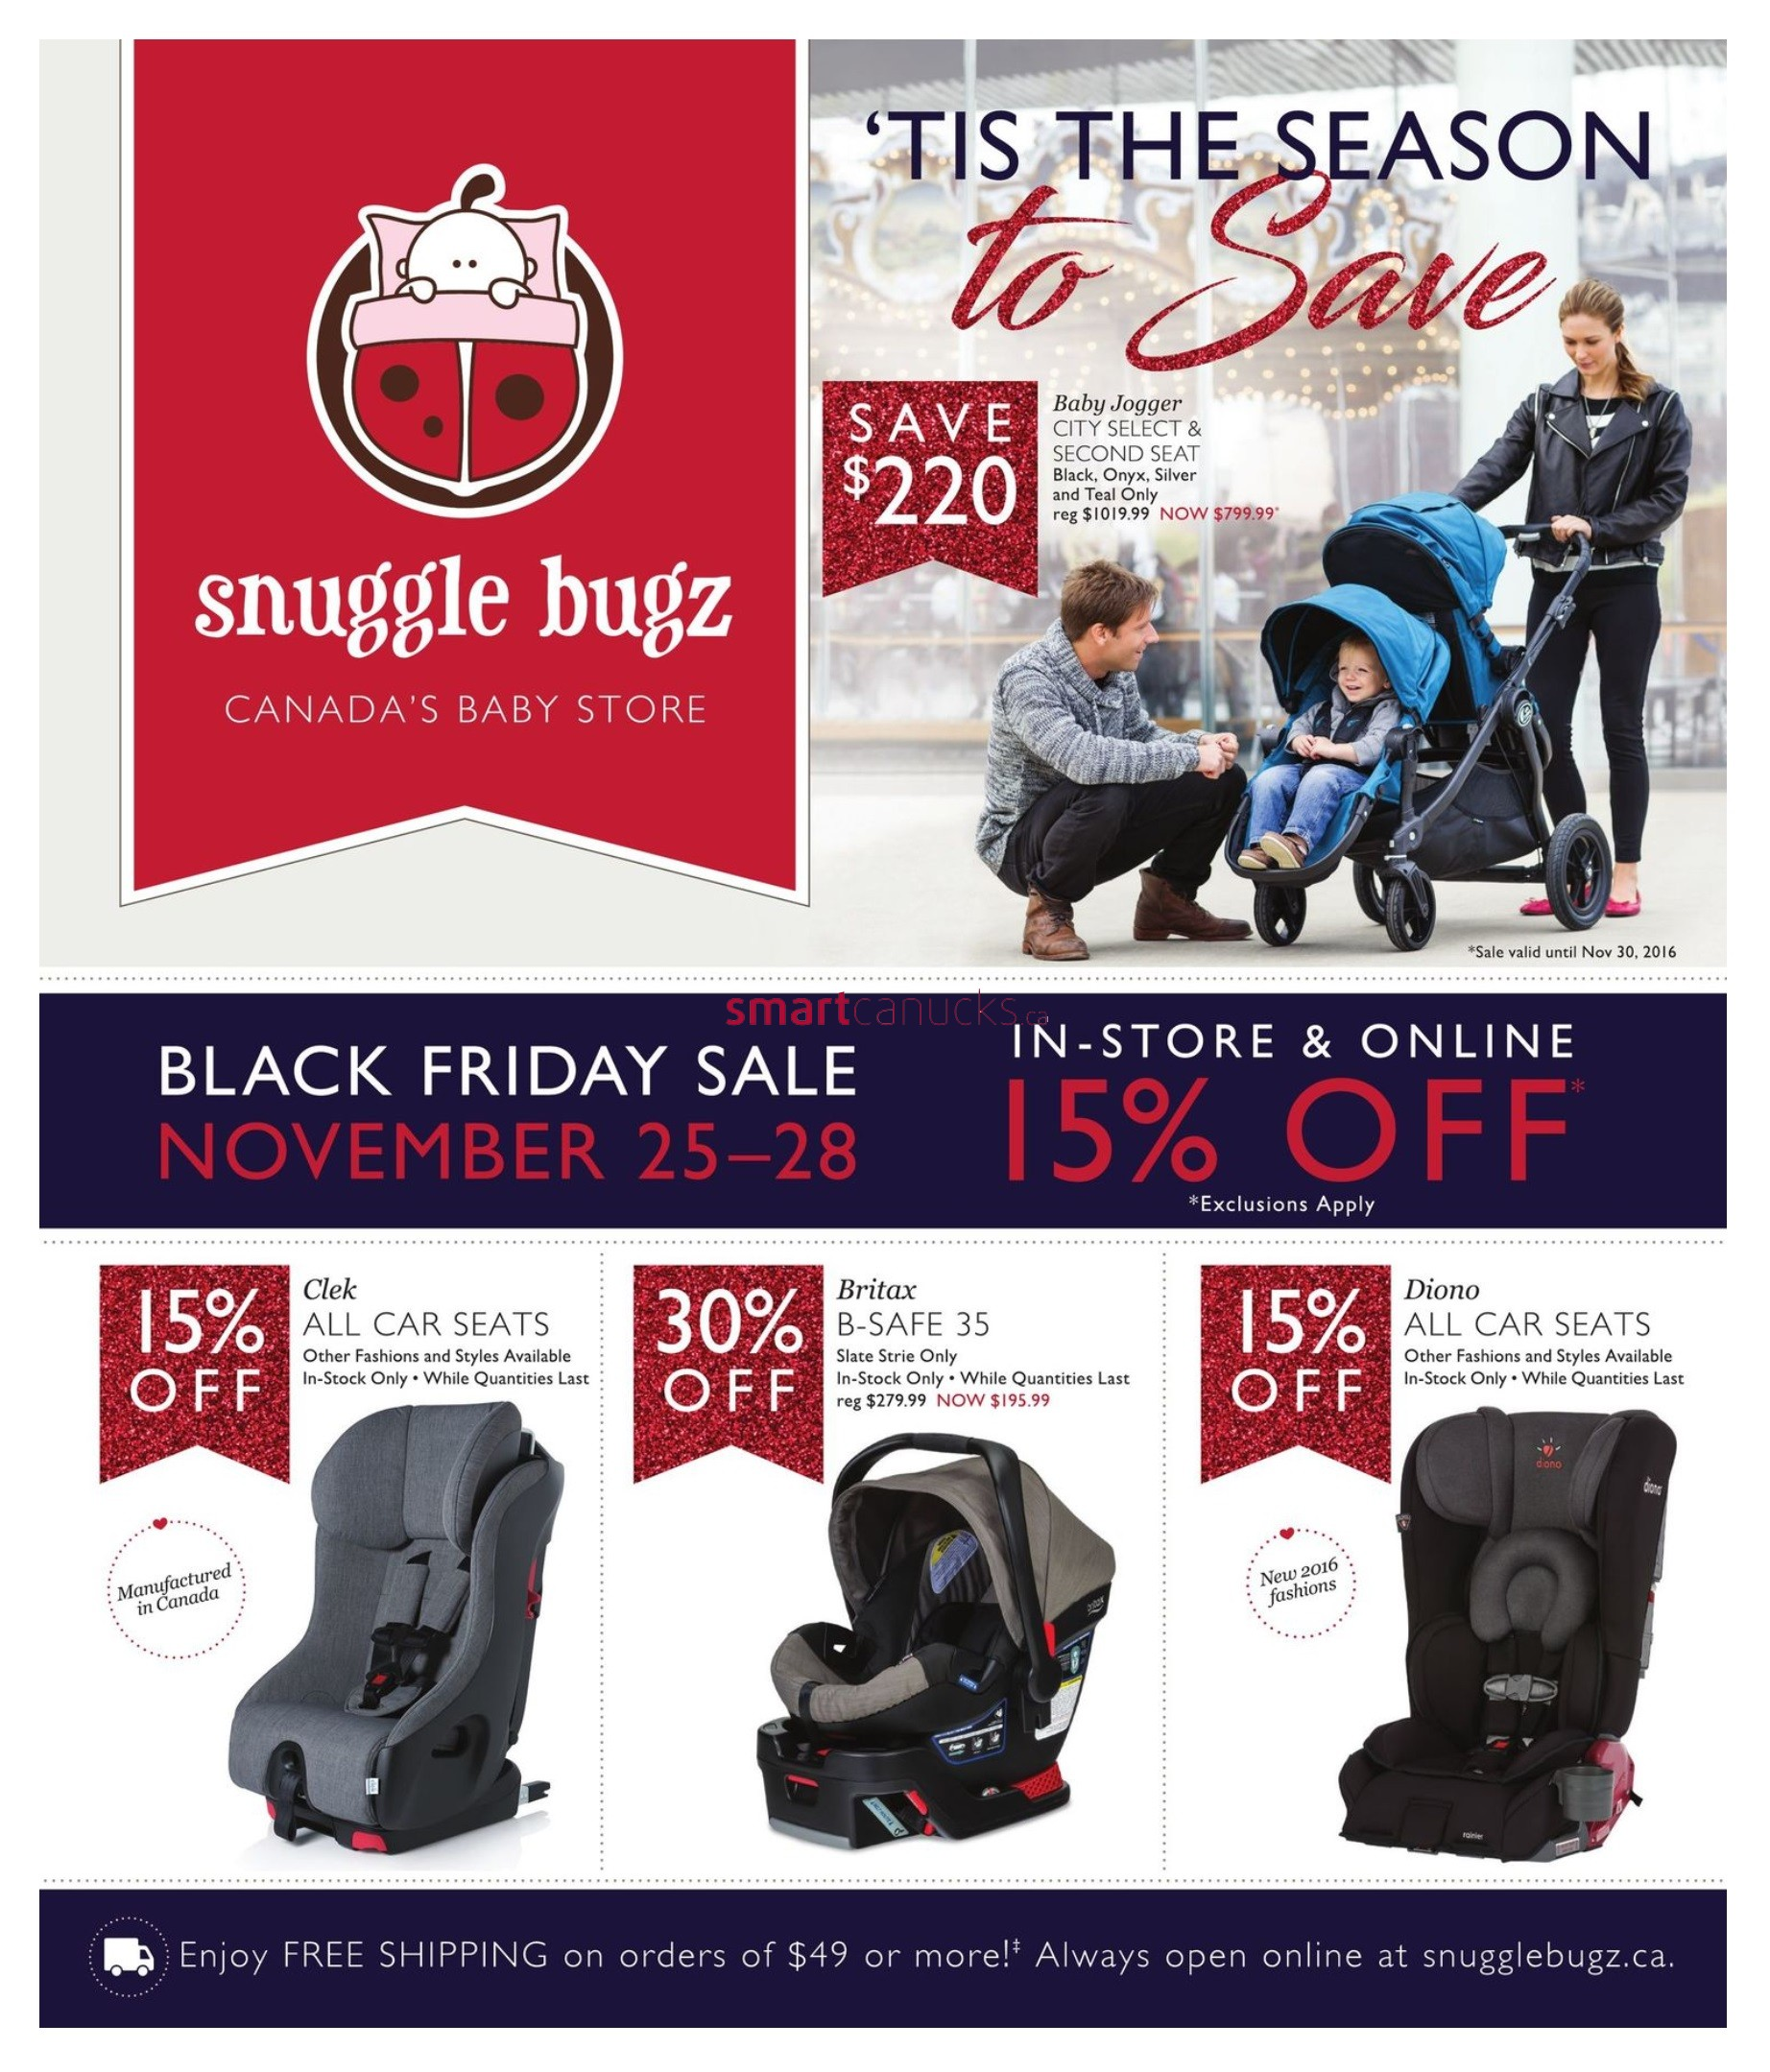 Snuggle bugz coupon code 2018 / Healthkart discount coupons december ...